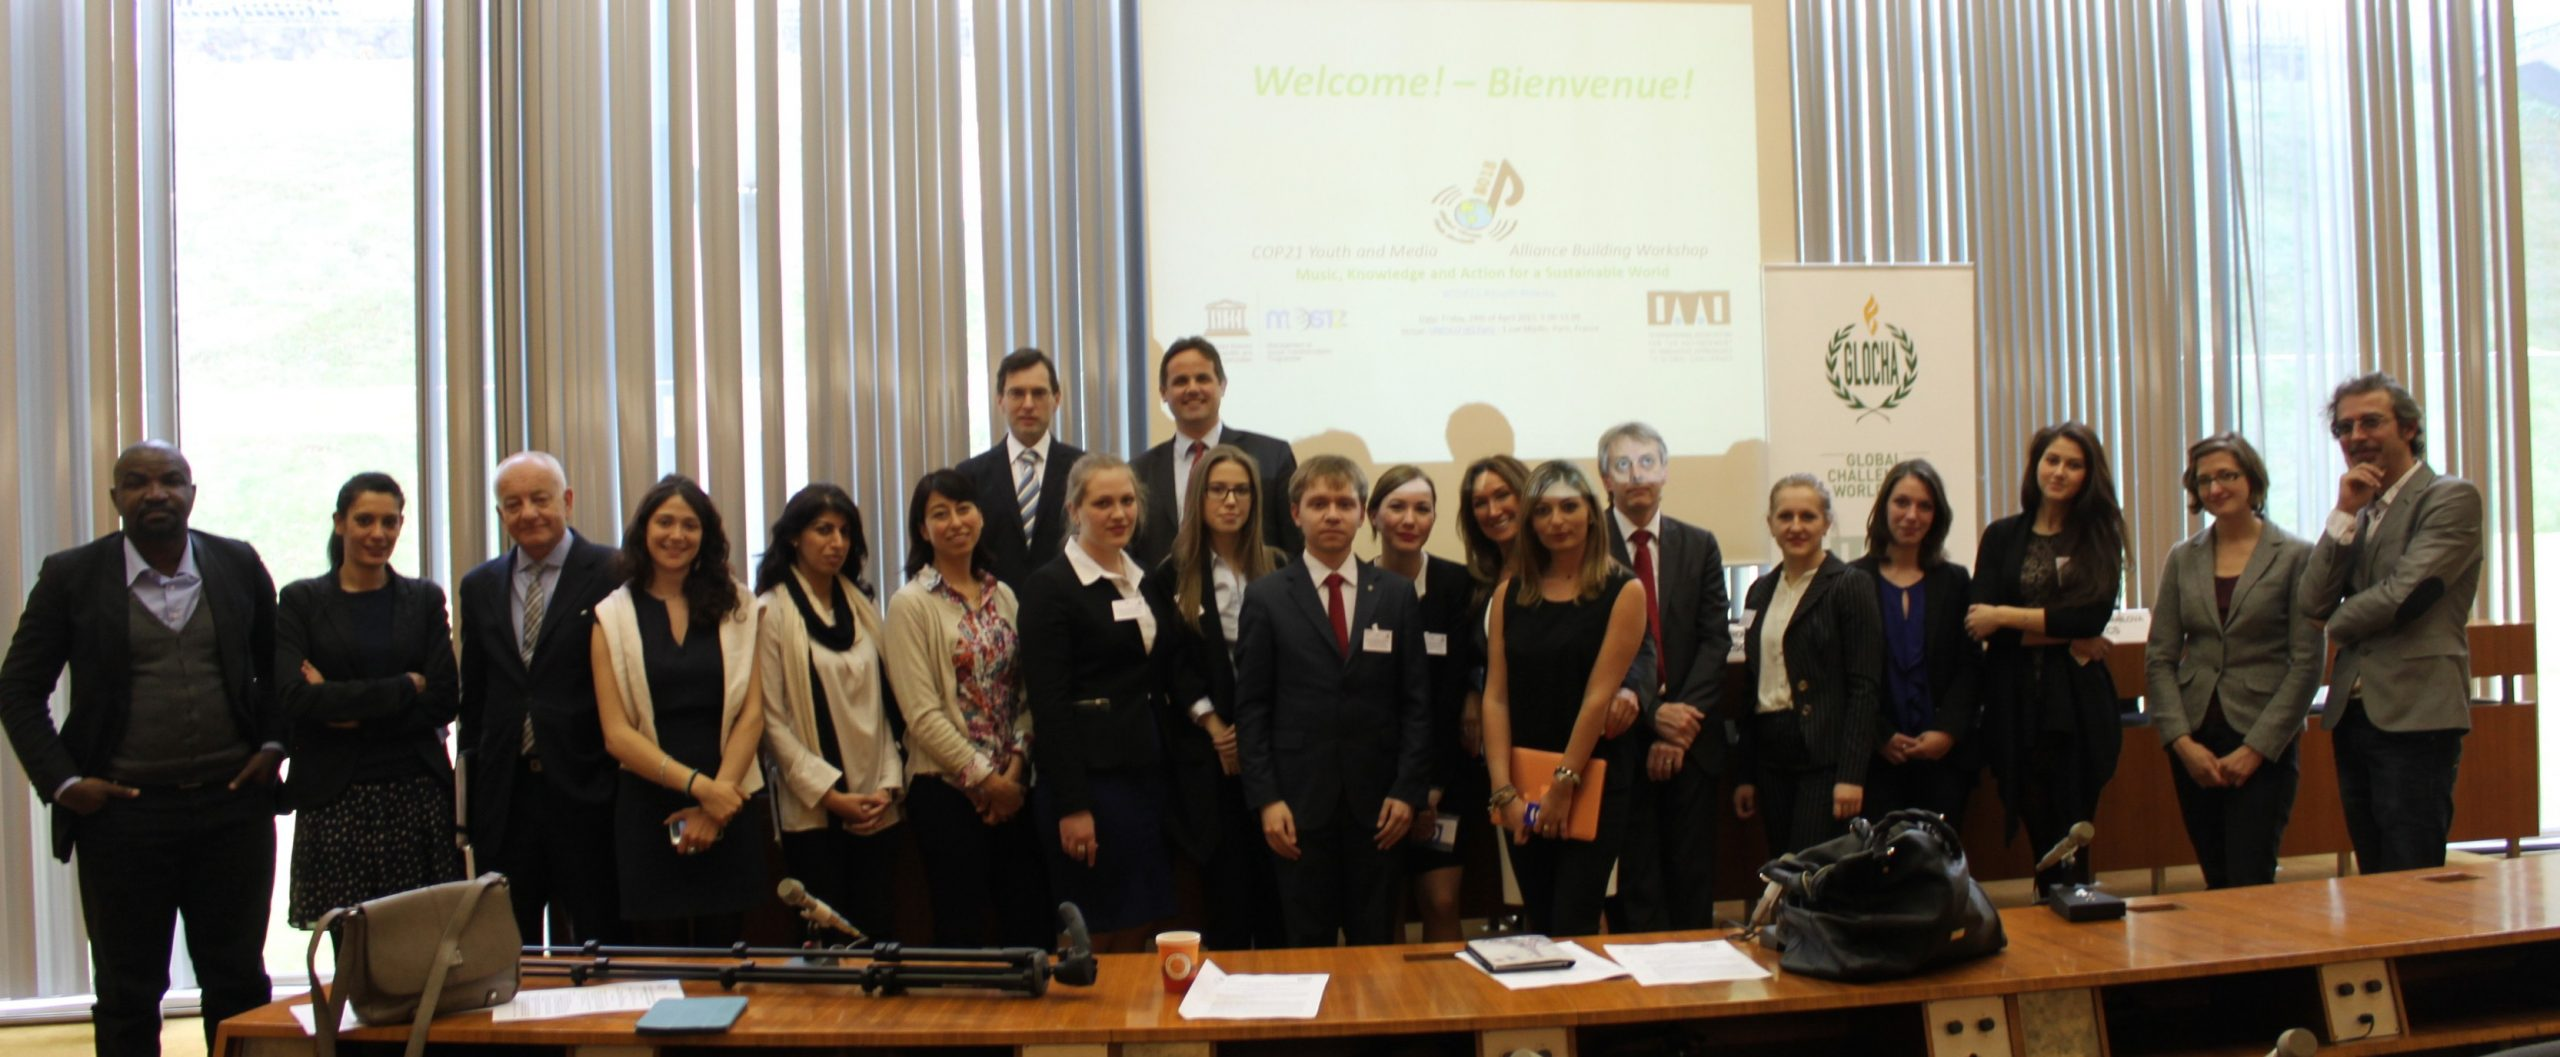 GroupPhoto Cop21 Youth Media Workshop UNESCO 24April2015